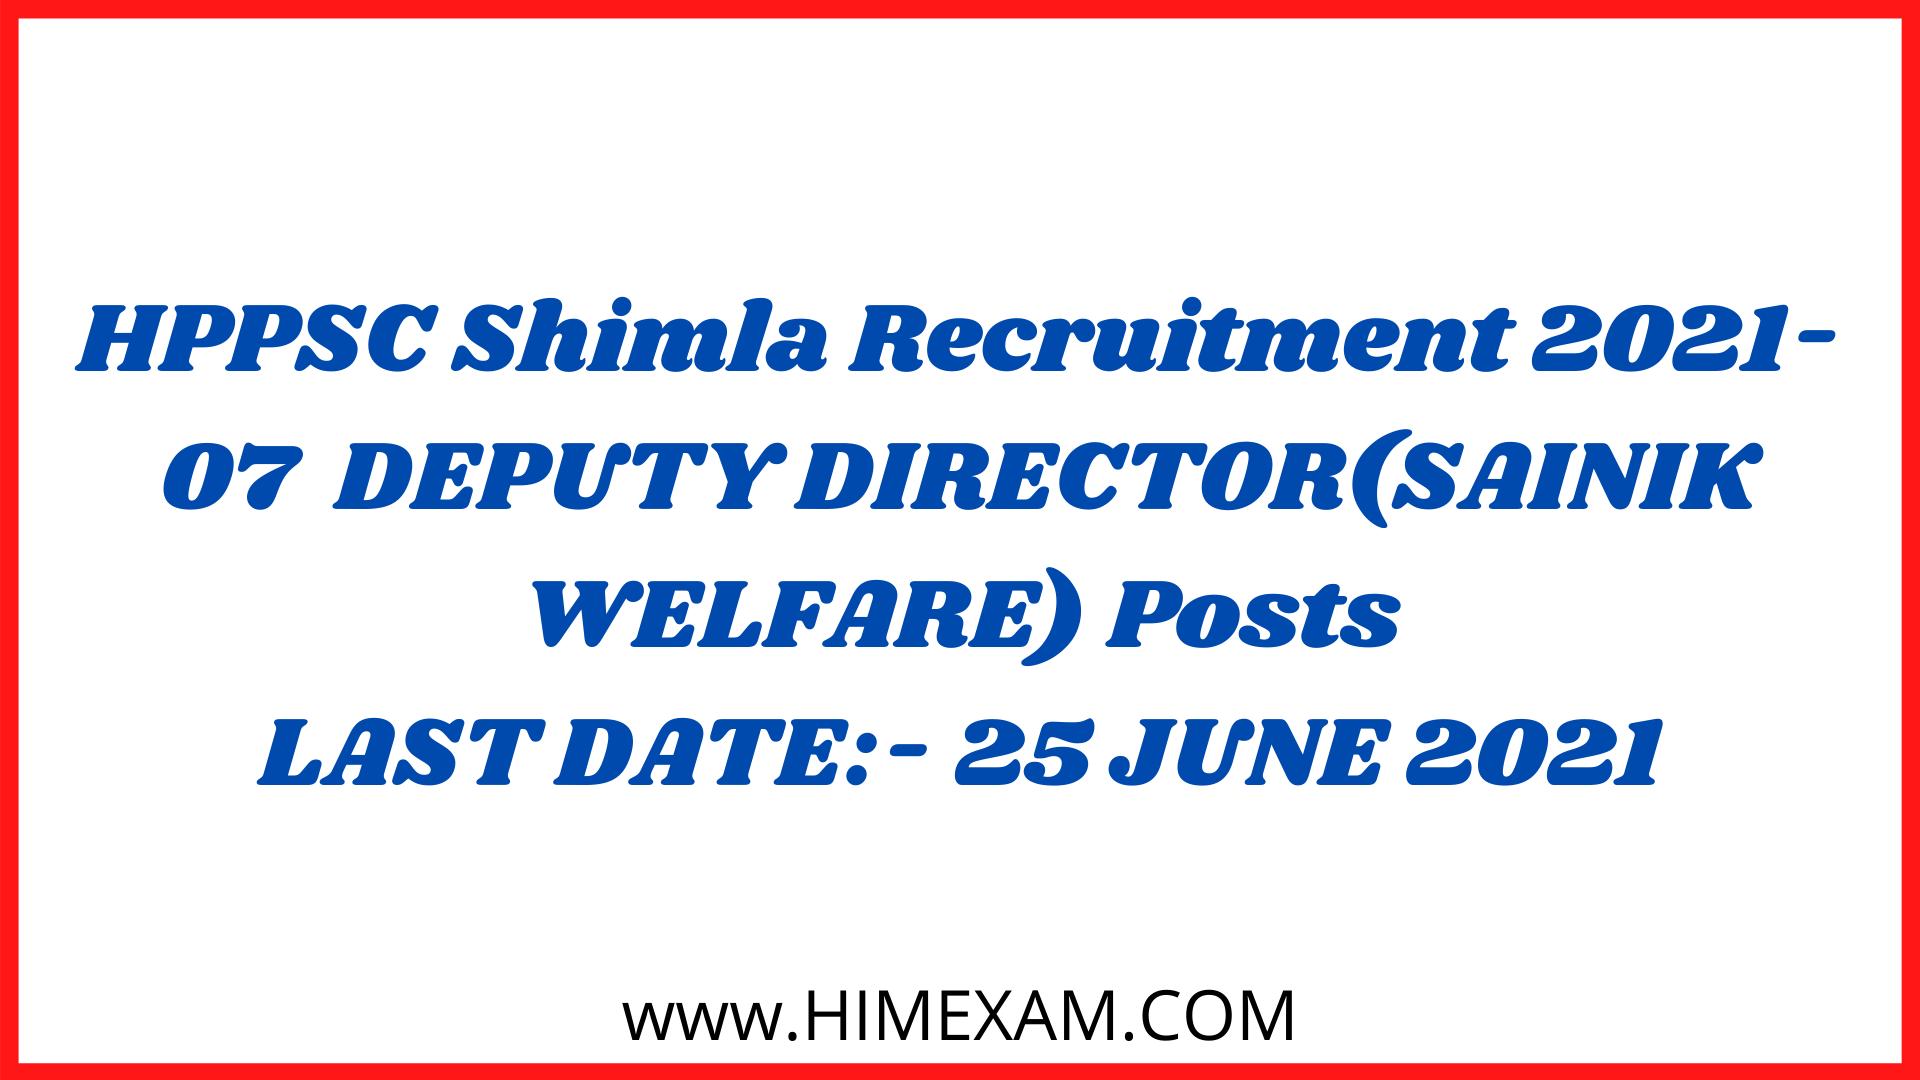 HPPSC Shimla Recruitment 2021-07  DEPUTY DIRECTOR(SAINIK WELFARE) Posts